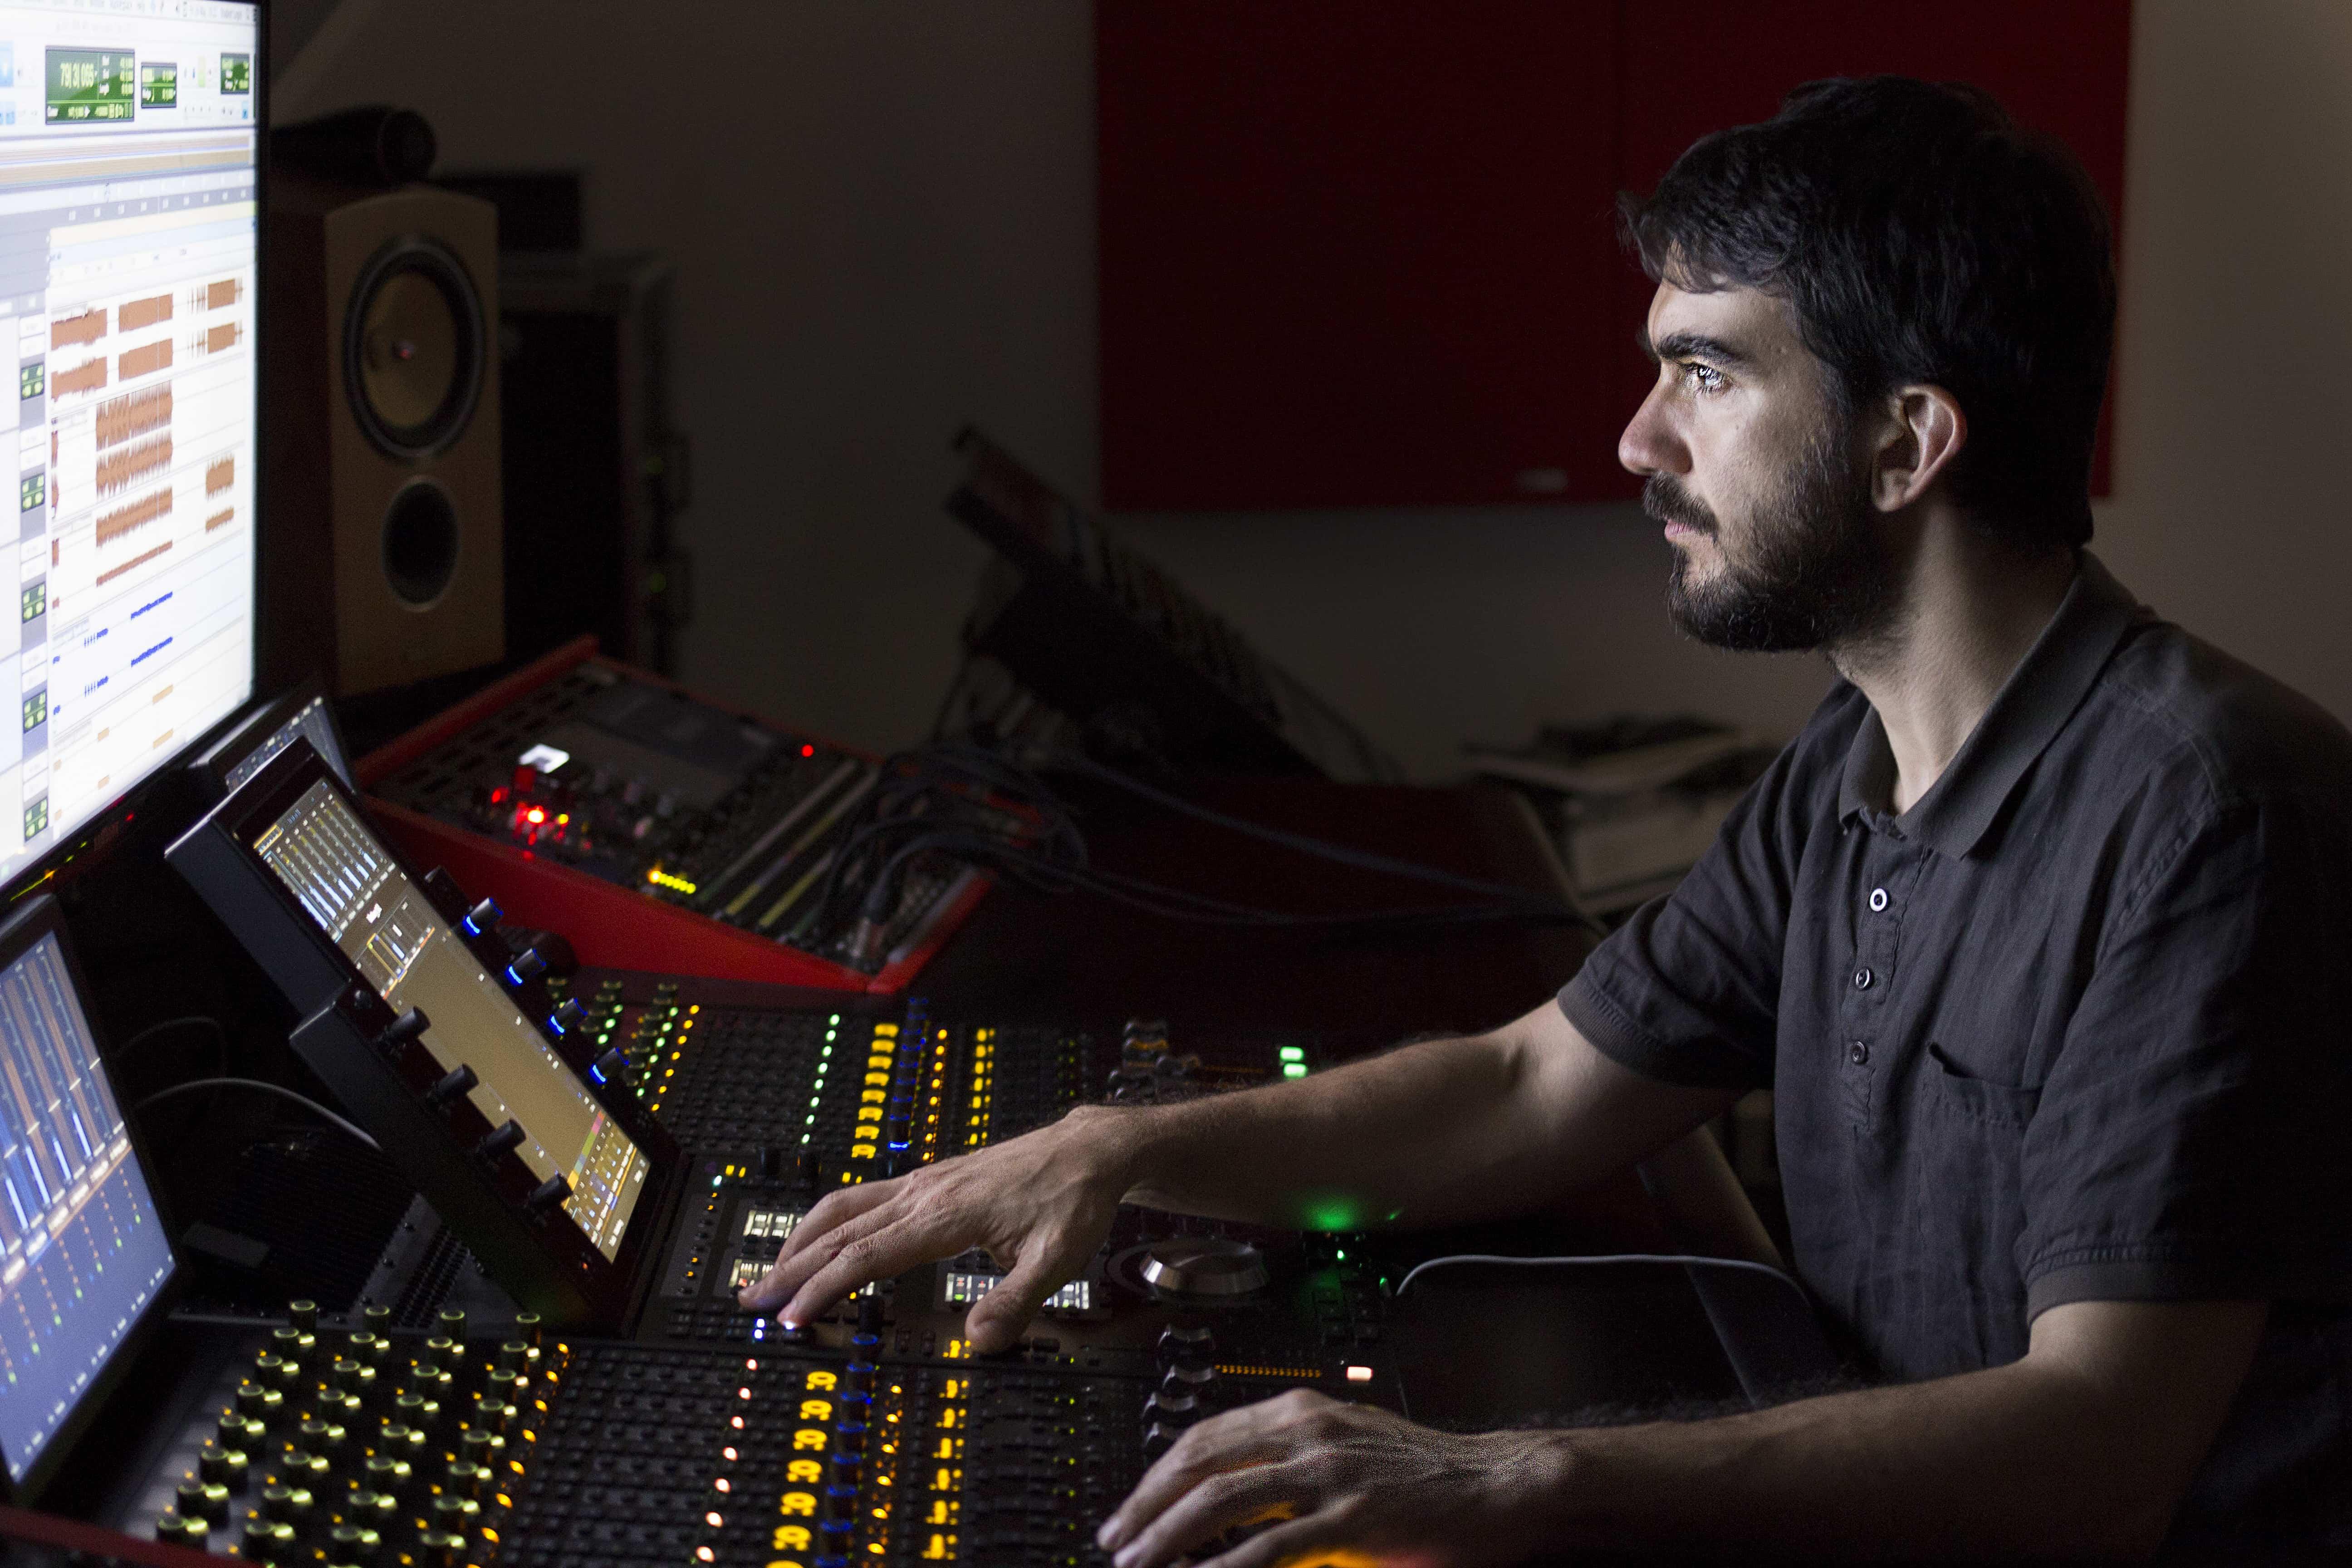 Carlos Bricio working at our Avid S6 M40 Console